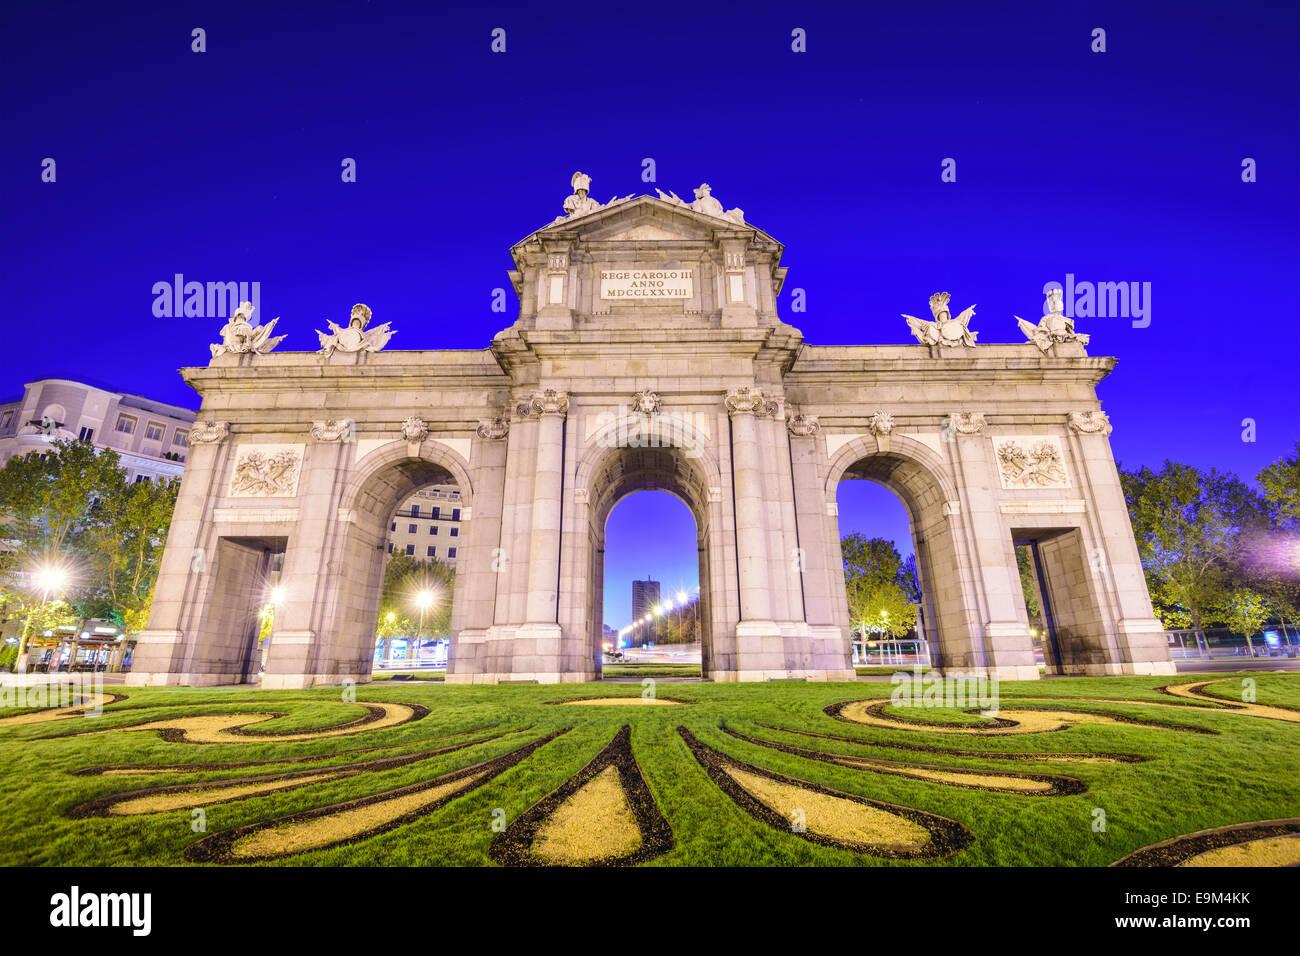 Puerta De Alcala gate in Madrid, Spain. - Stock Image